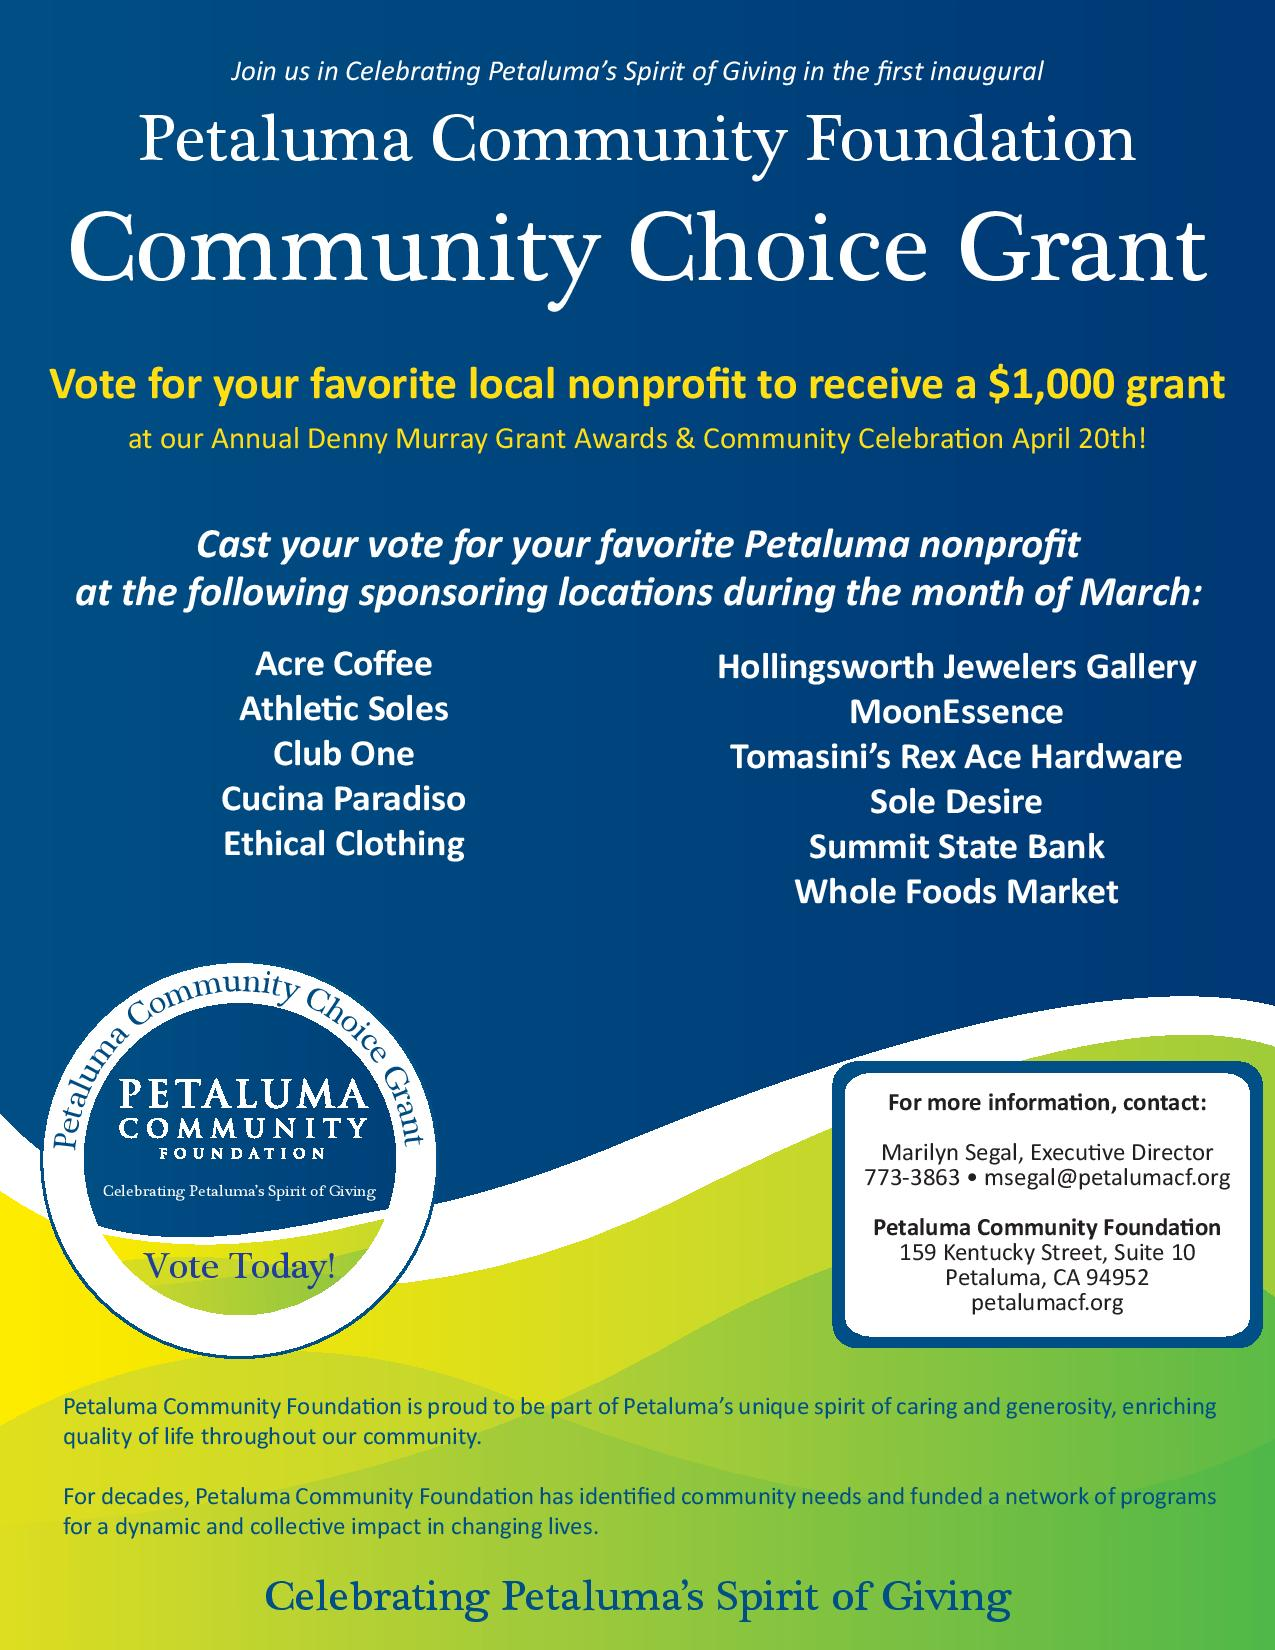 Community-Choice-Grant-Petaluma-Community-Foundation-page-001